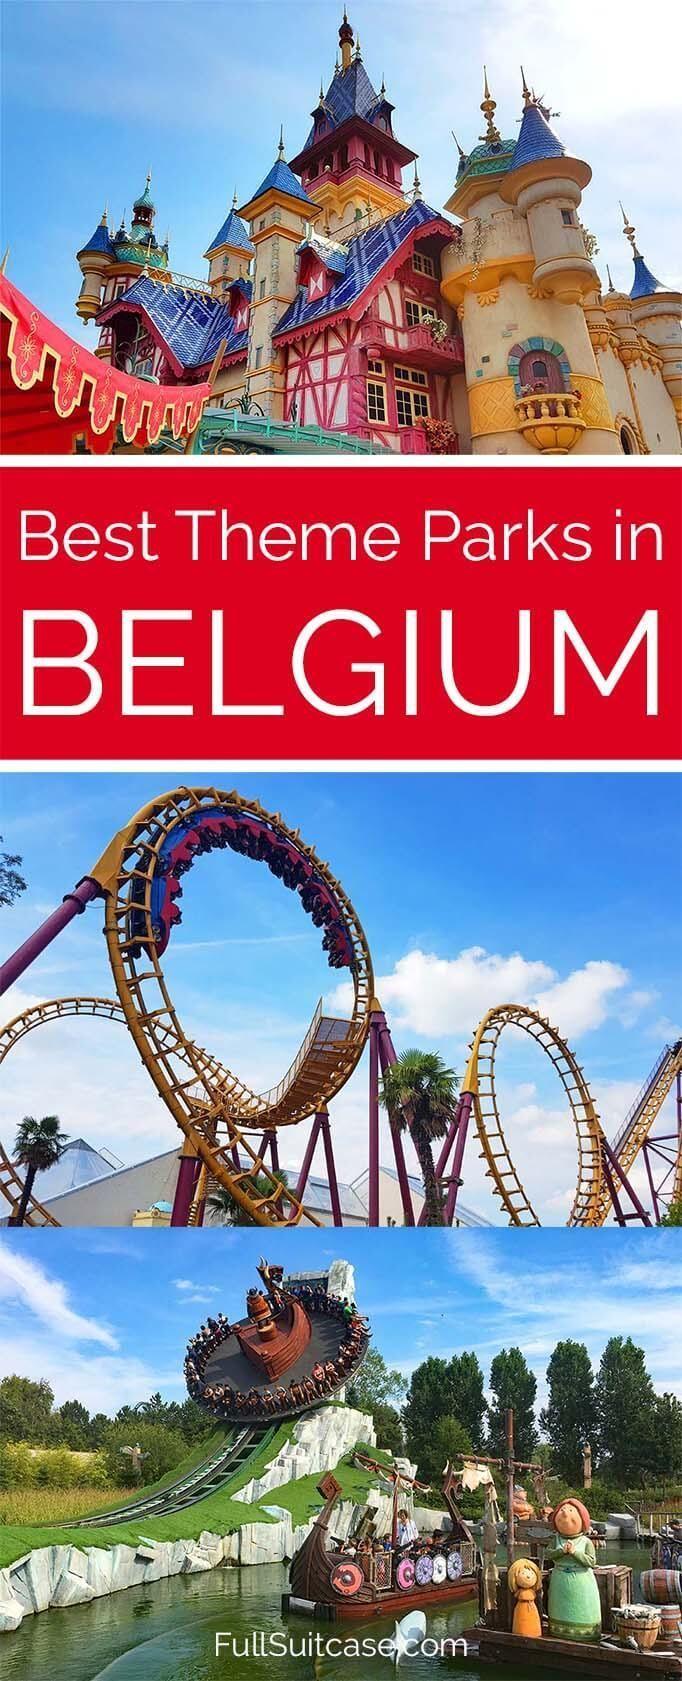 8 Best Theme Parks In Belgium Review And Tips Belgium Travel Best Amusement Parks Theme Park